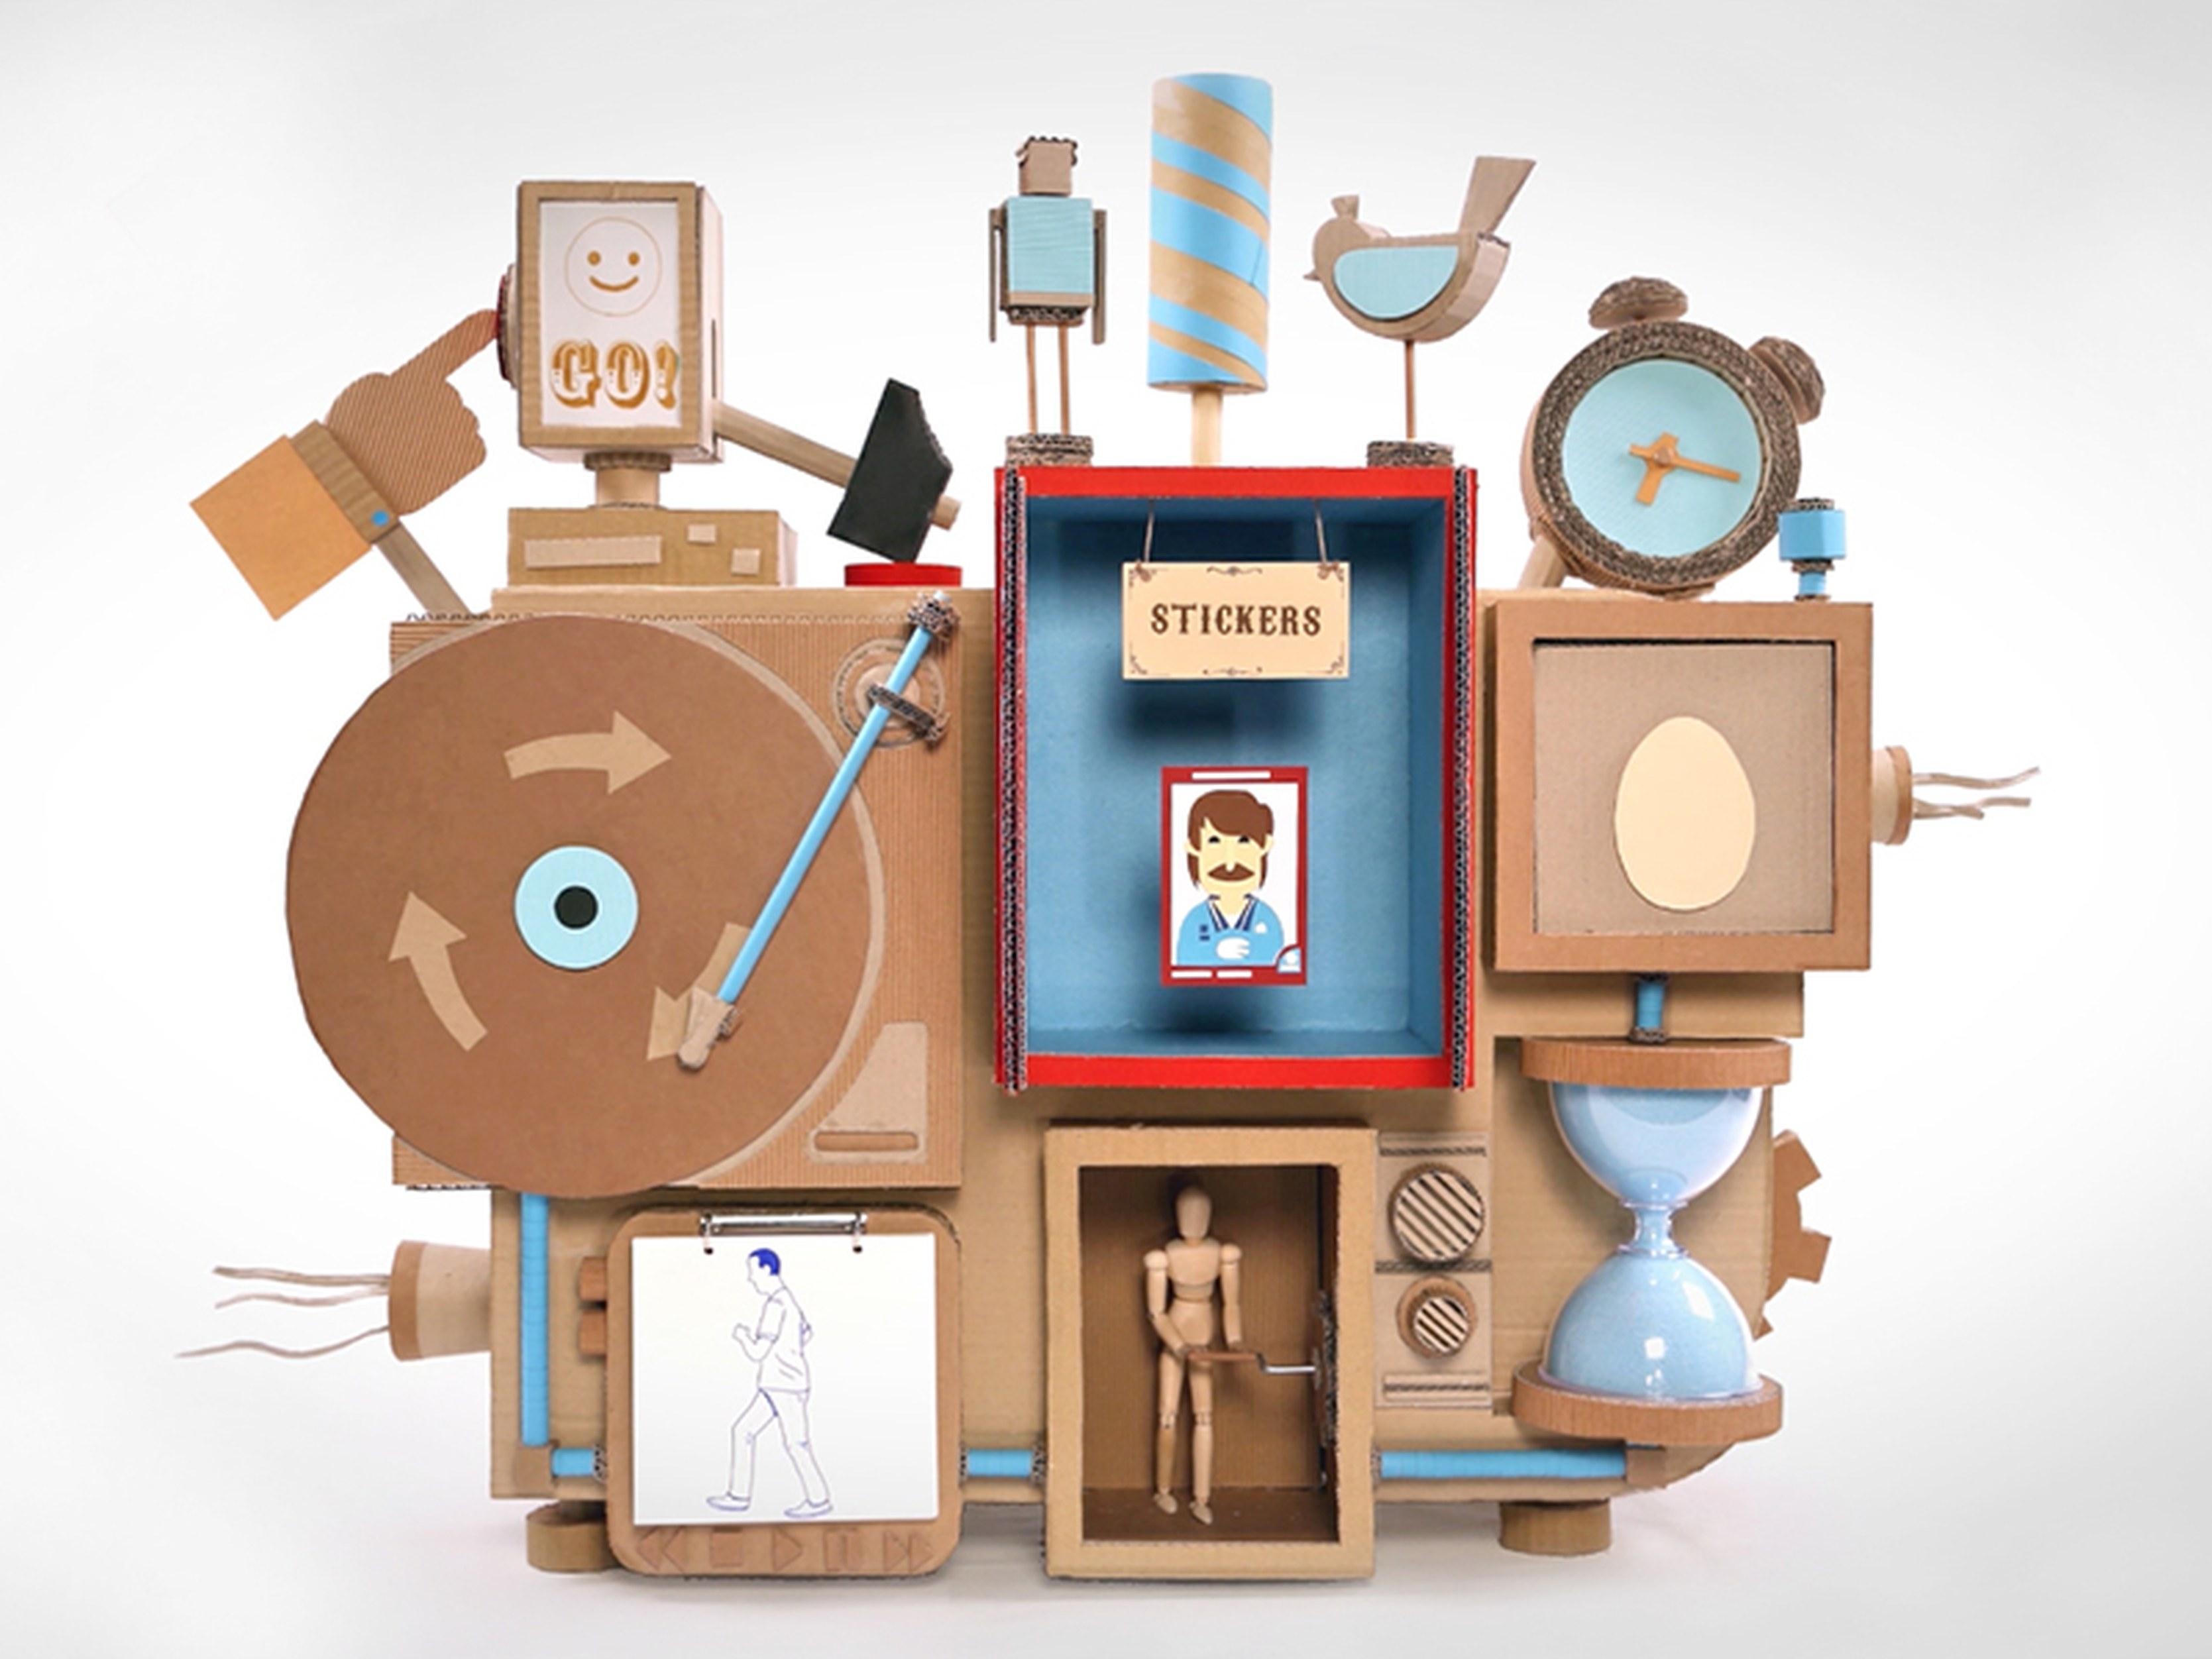 https://www.promotionmagazine.it/wp/wp-content/uploads/2016/05/Pixartprinting_The-Fabulous-Pixartprinting-Time-Machine_stickers_300dpi.jpg